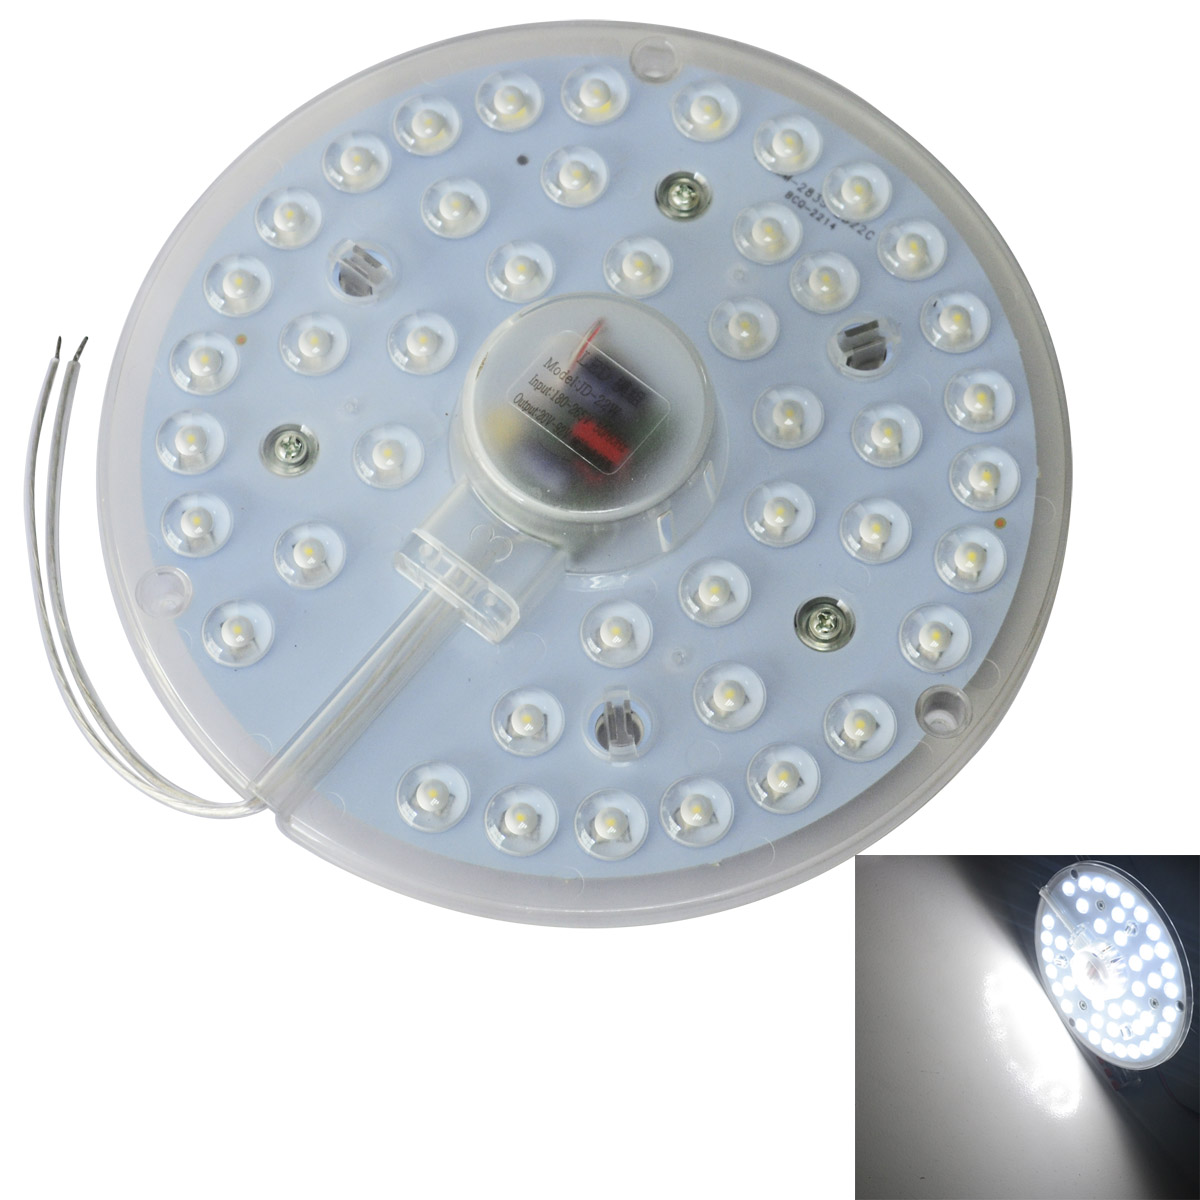 Jiawen 24w Cool White Led Module Led Ceiling Lamp Light